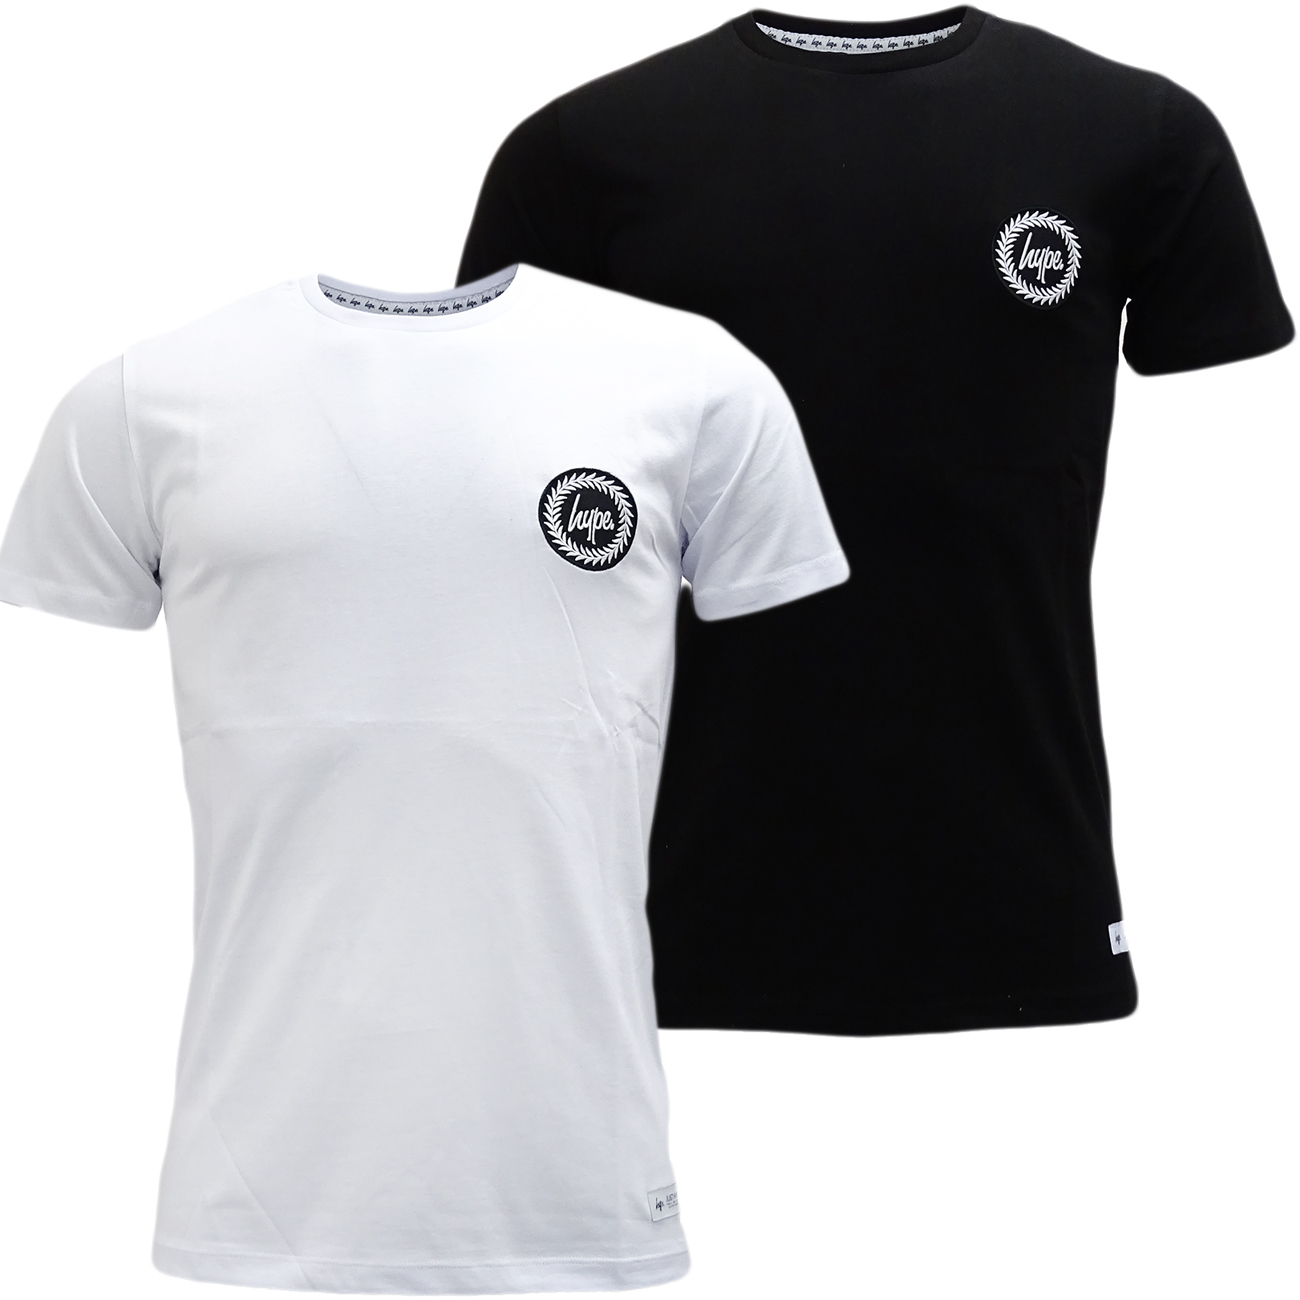 Just hype plain t shirt with crest hype logo daily deals for Levis plain t shirts